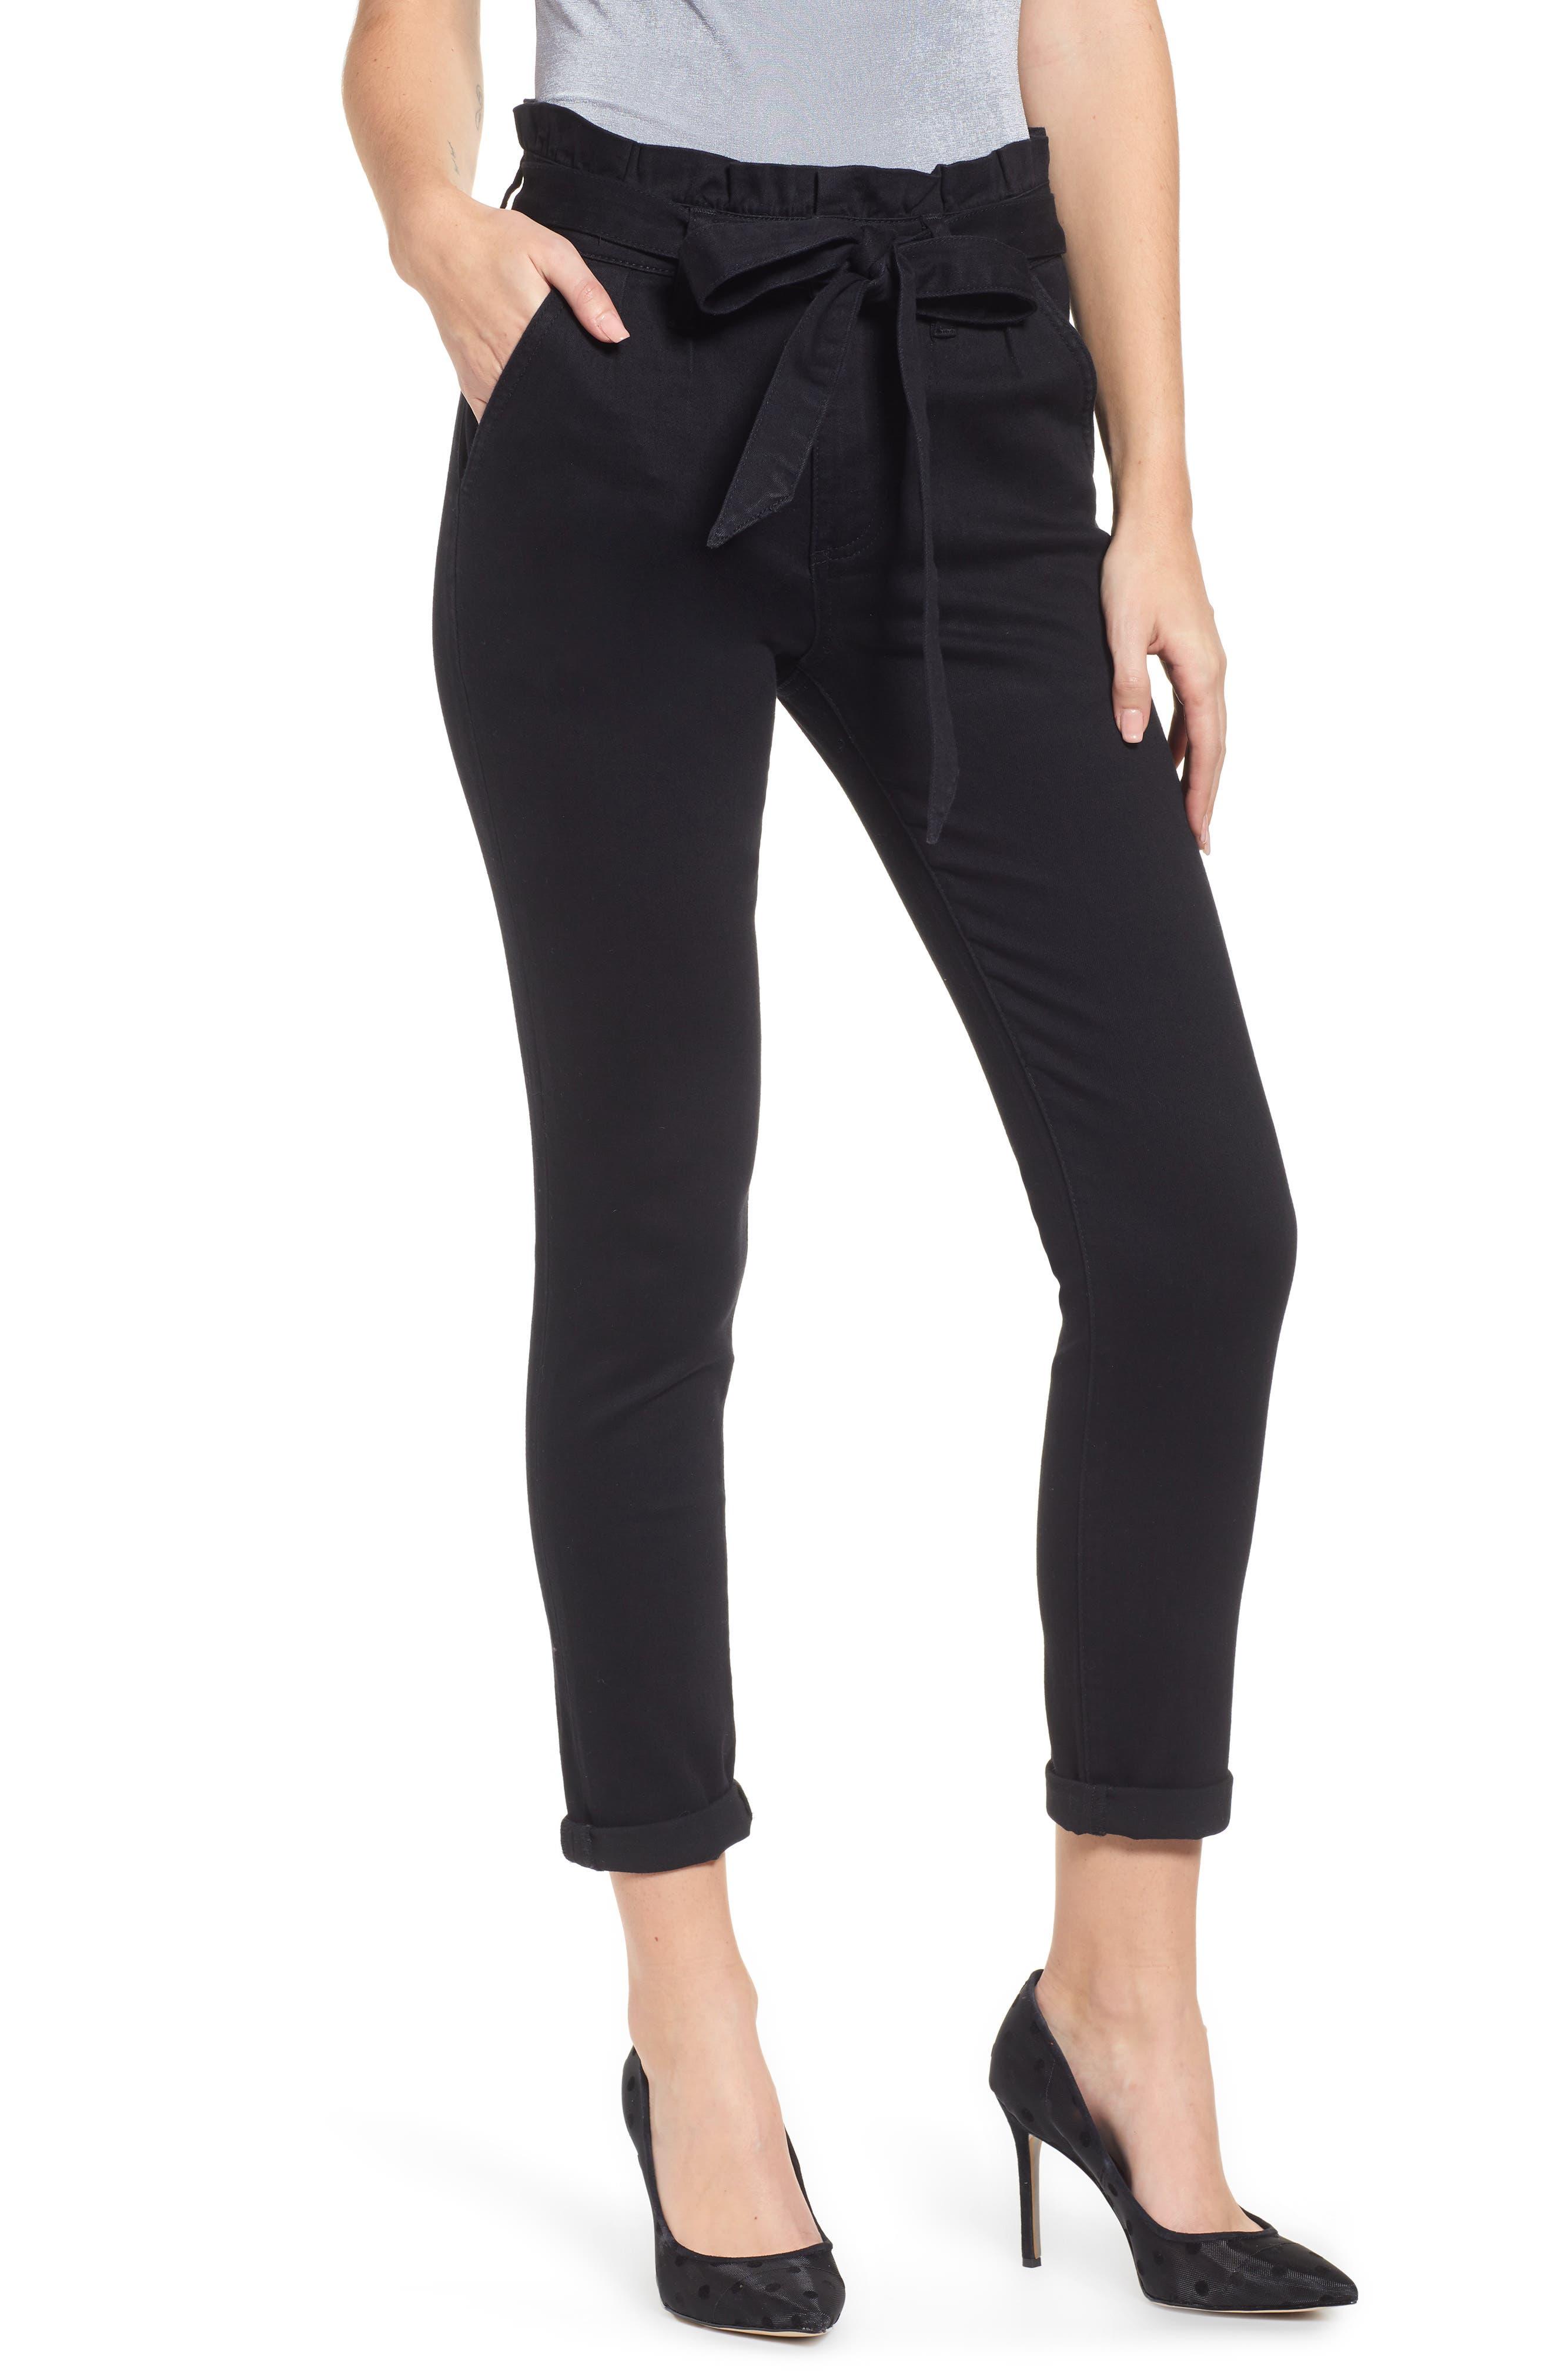 PROSPERITY DENIM, Paperbag Waist Skinny Jeans, Main thumbnail 1, color, BLACK